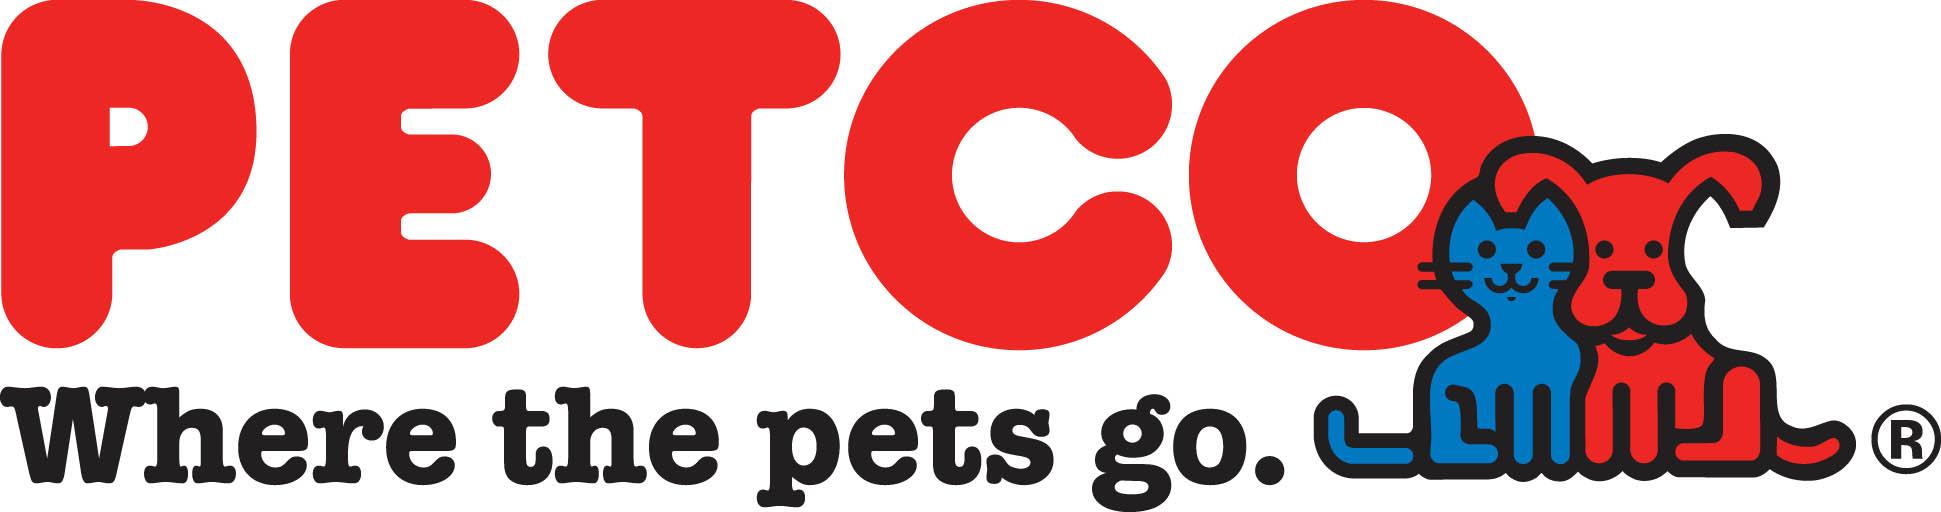 PETCO Animal Supplies Coupon